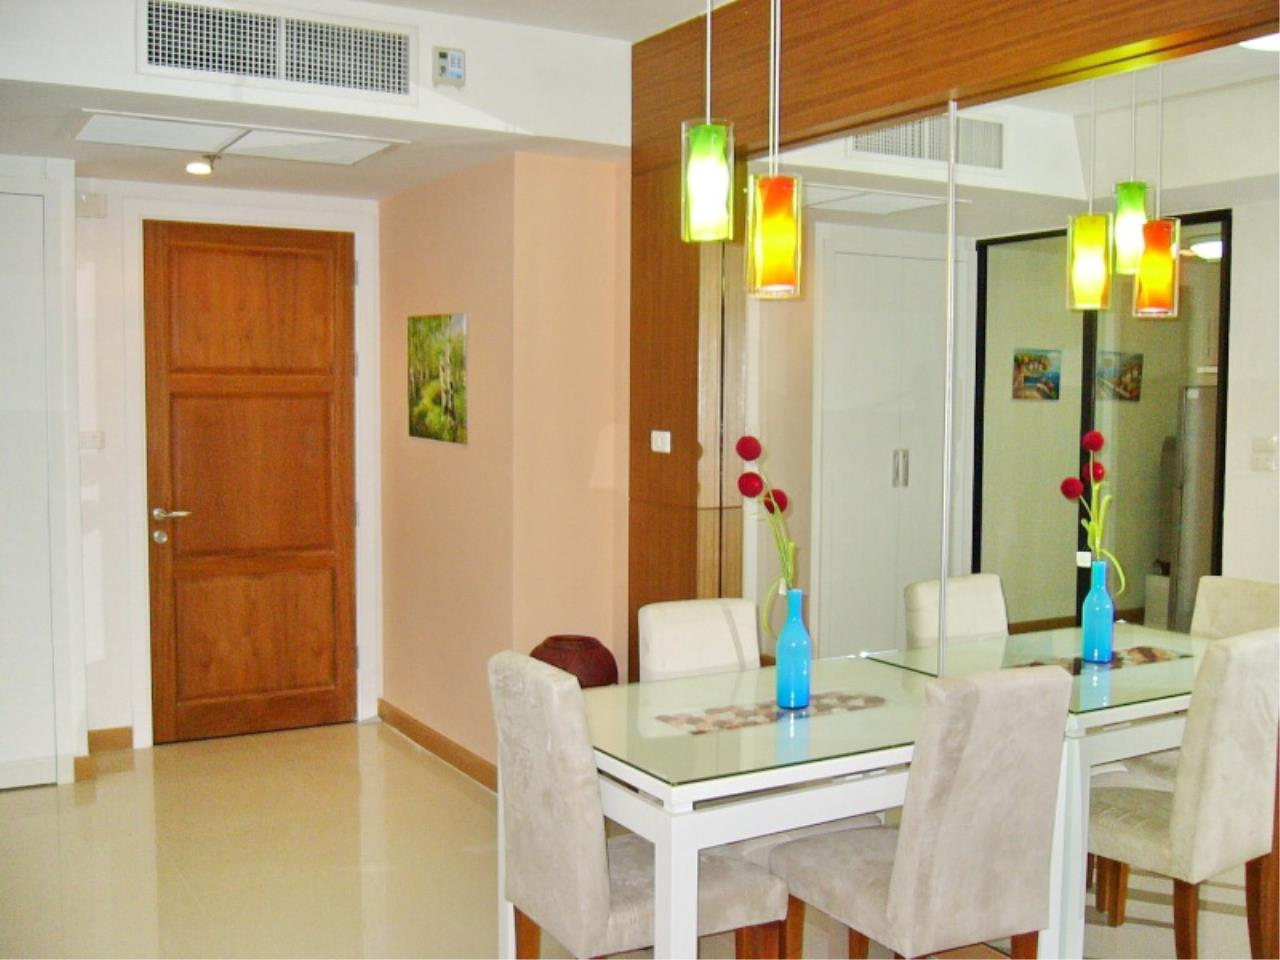 Agent - Mayteekul Sujirapinyokul Agency's AC4180418 For Rent Condo Supalai Premier Place Asoke Condo MRT Phetchaburi 4